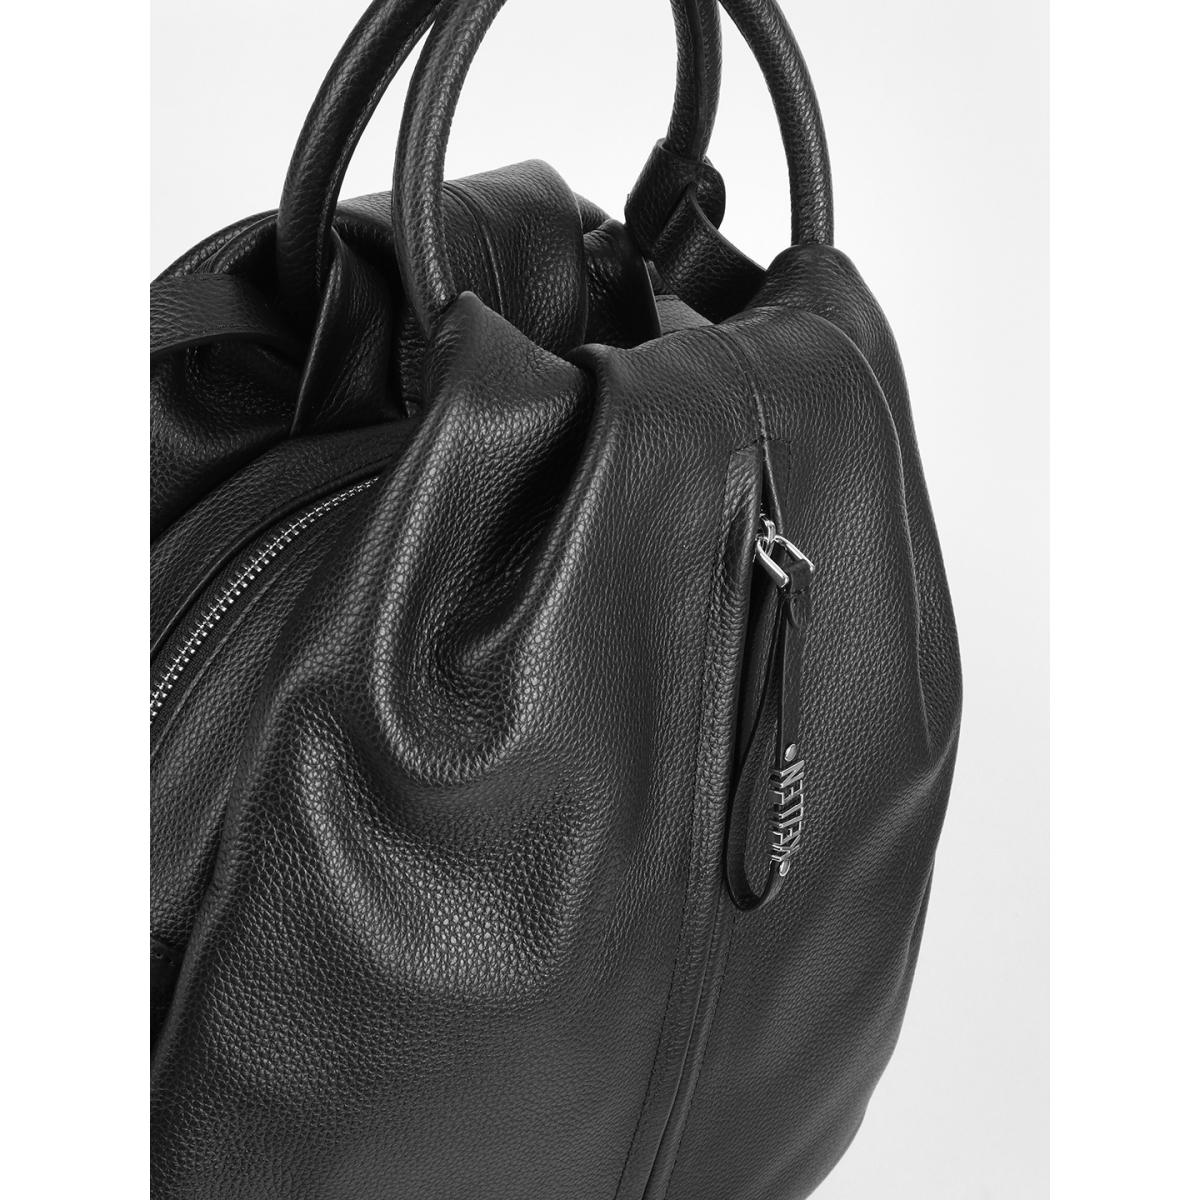 Kellen 1375 kd nero, женский  рюкзак